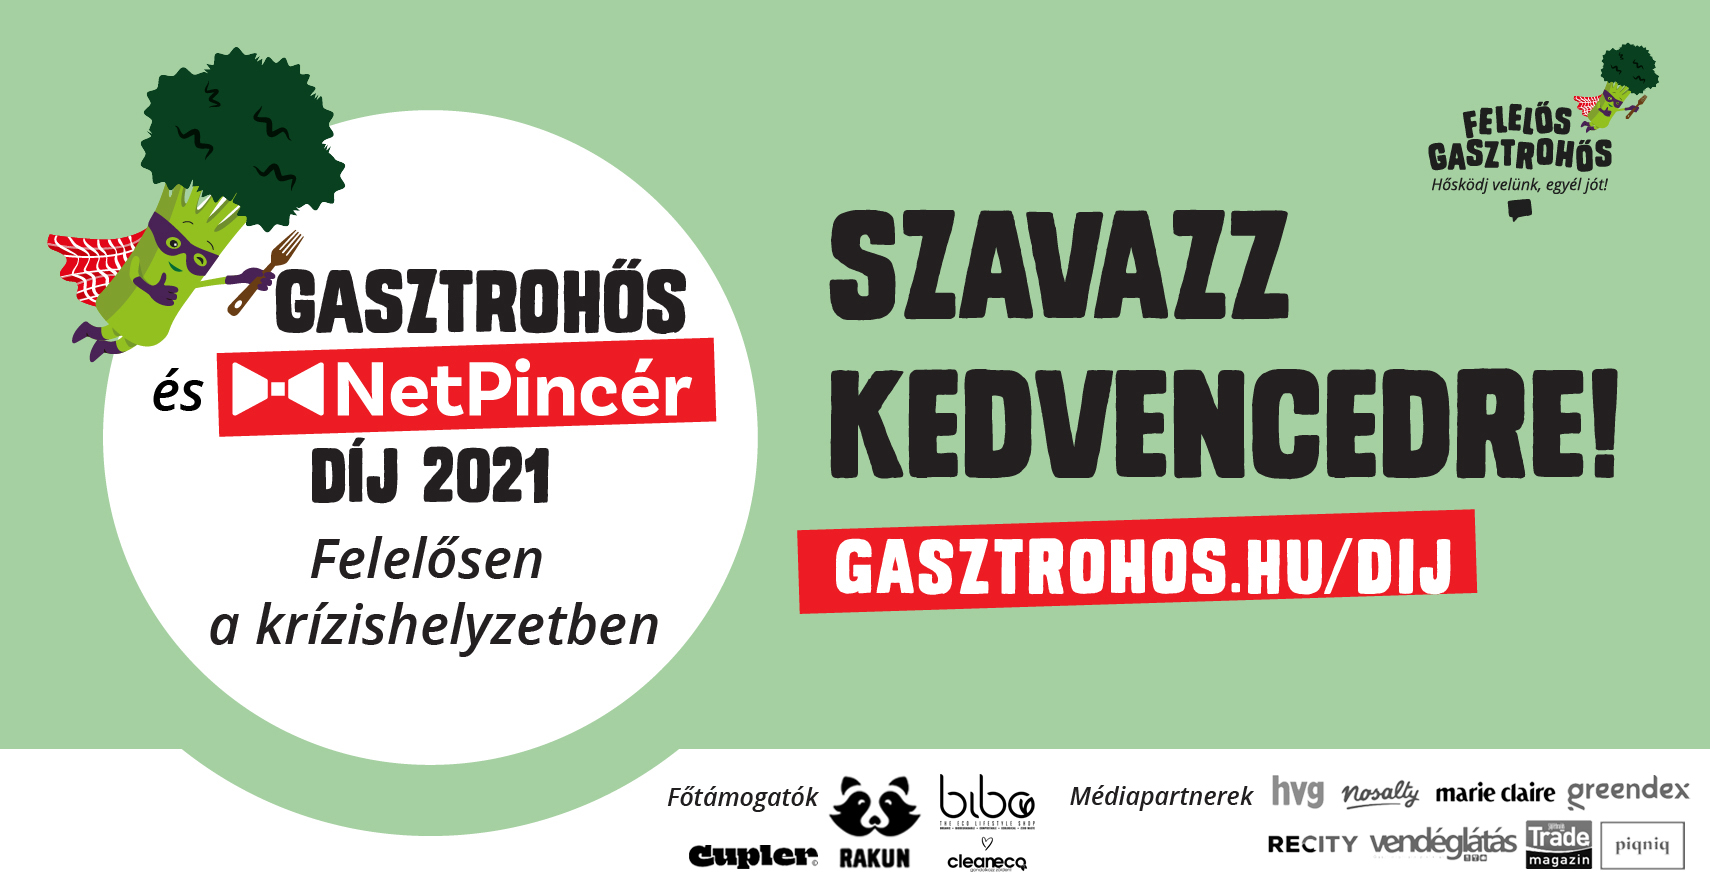 Felelos-Gasztrohos-Dij-2021-02-02